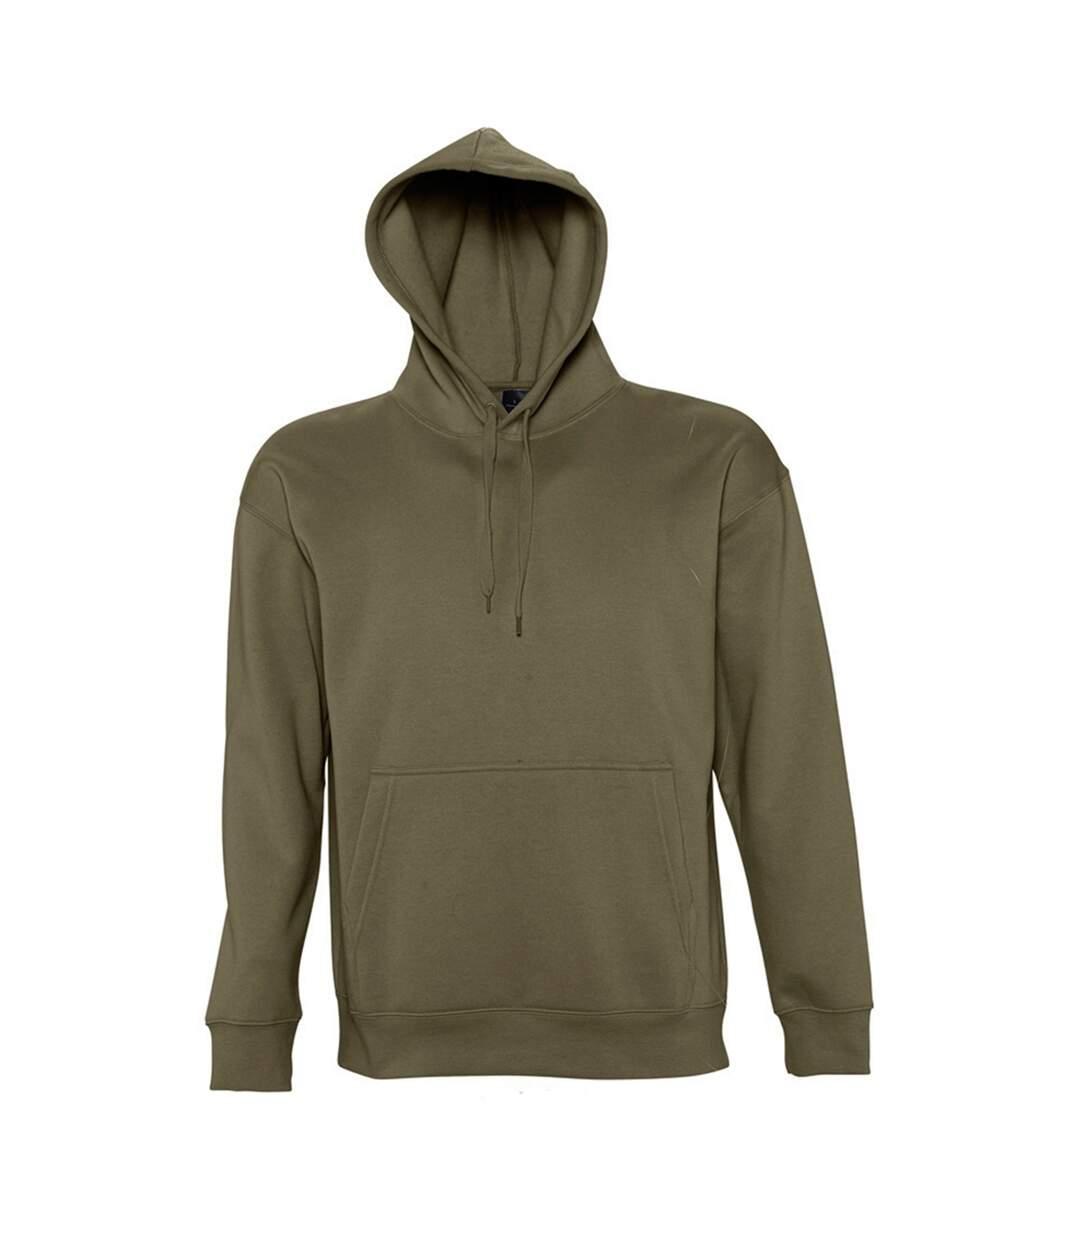 Sols Slam - Sweatshirt À Capuche - Homme (Vert armée) - UTPC381